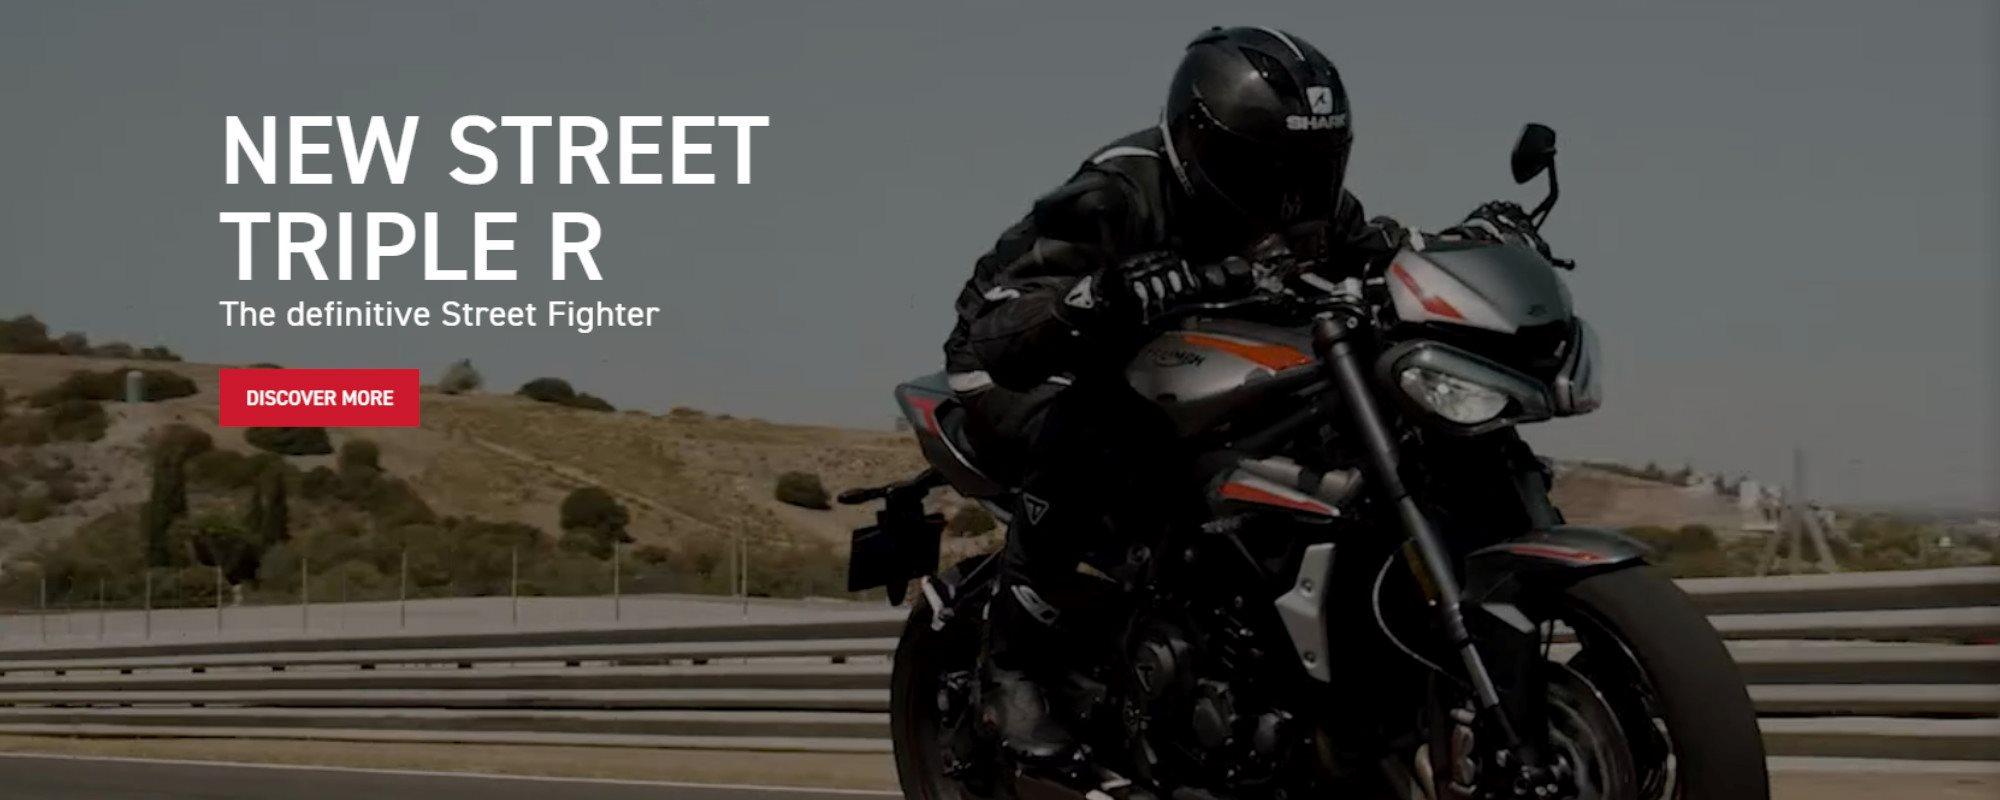 NEW STREET TRIPLE RS